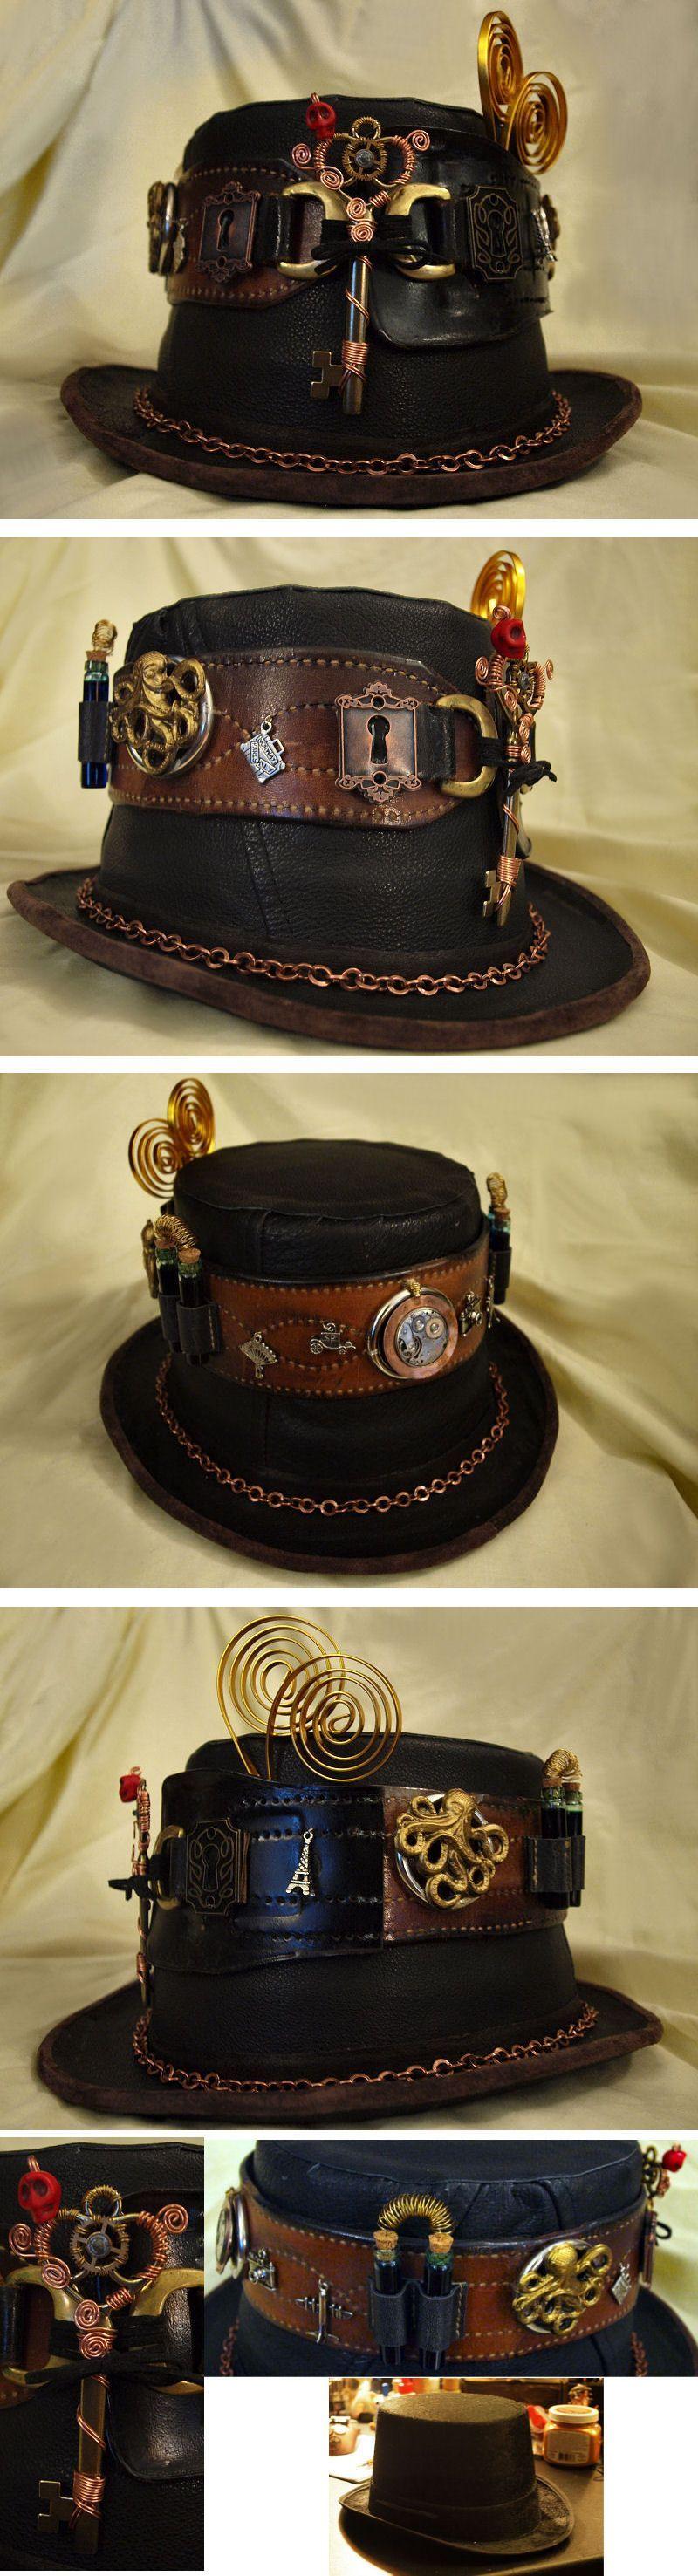 Steampunk Steampunk Leather Top Hat, By Ajldesign,